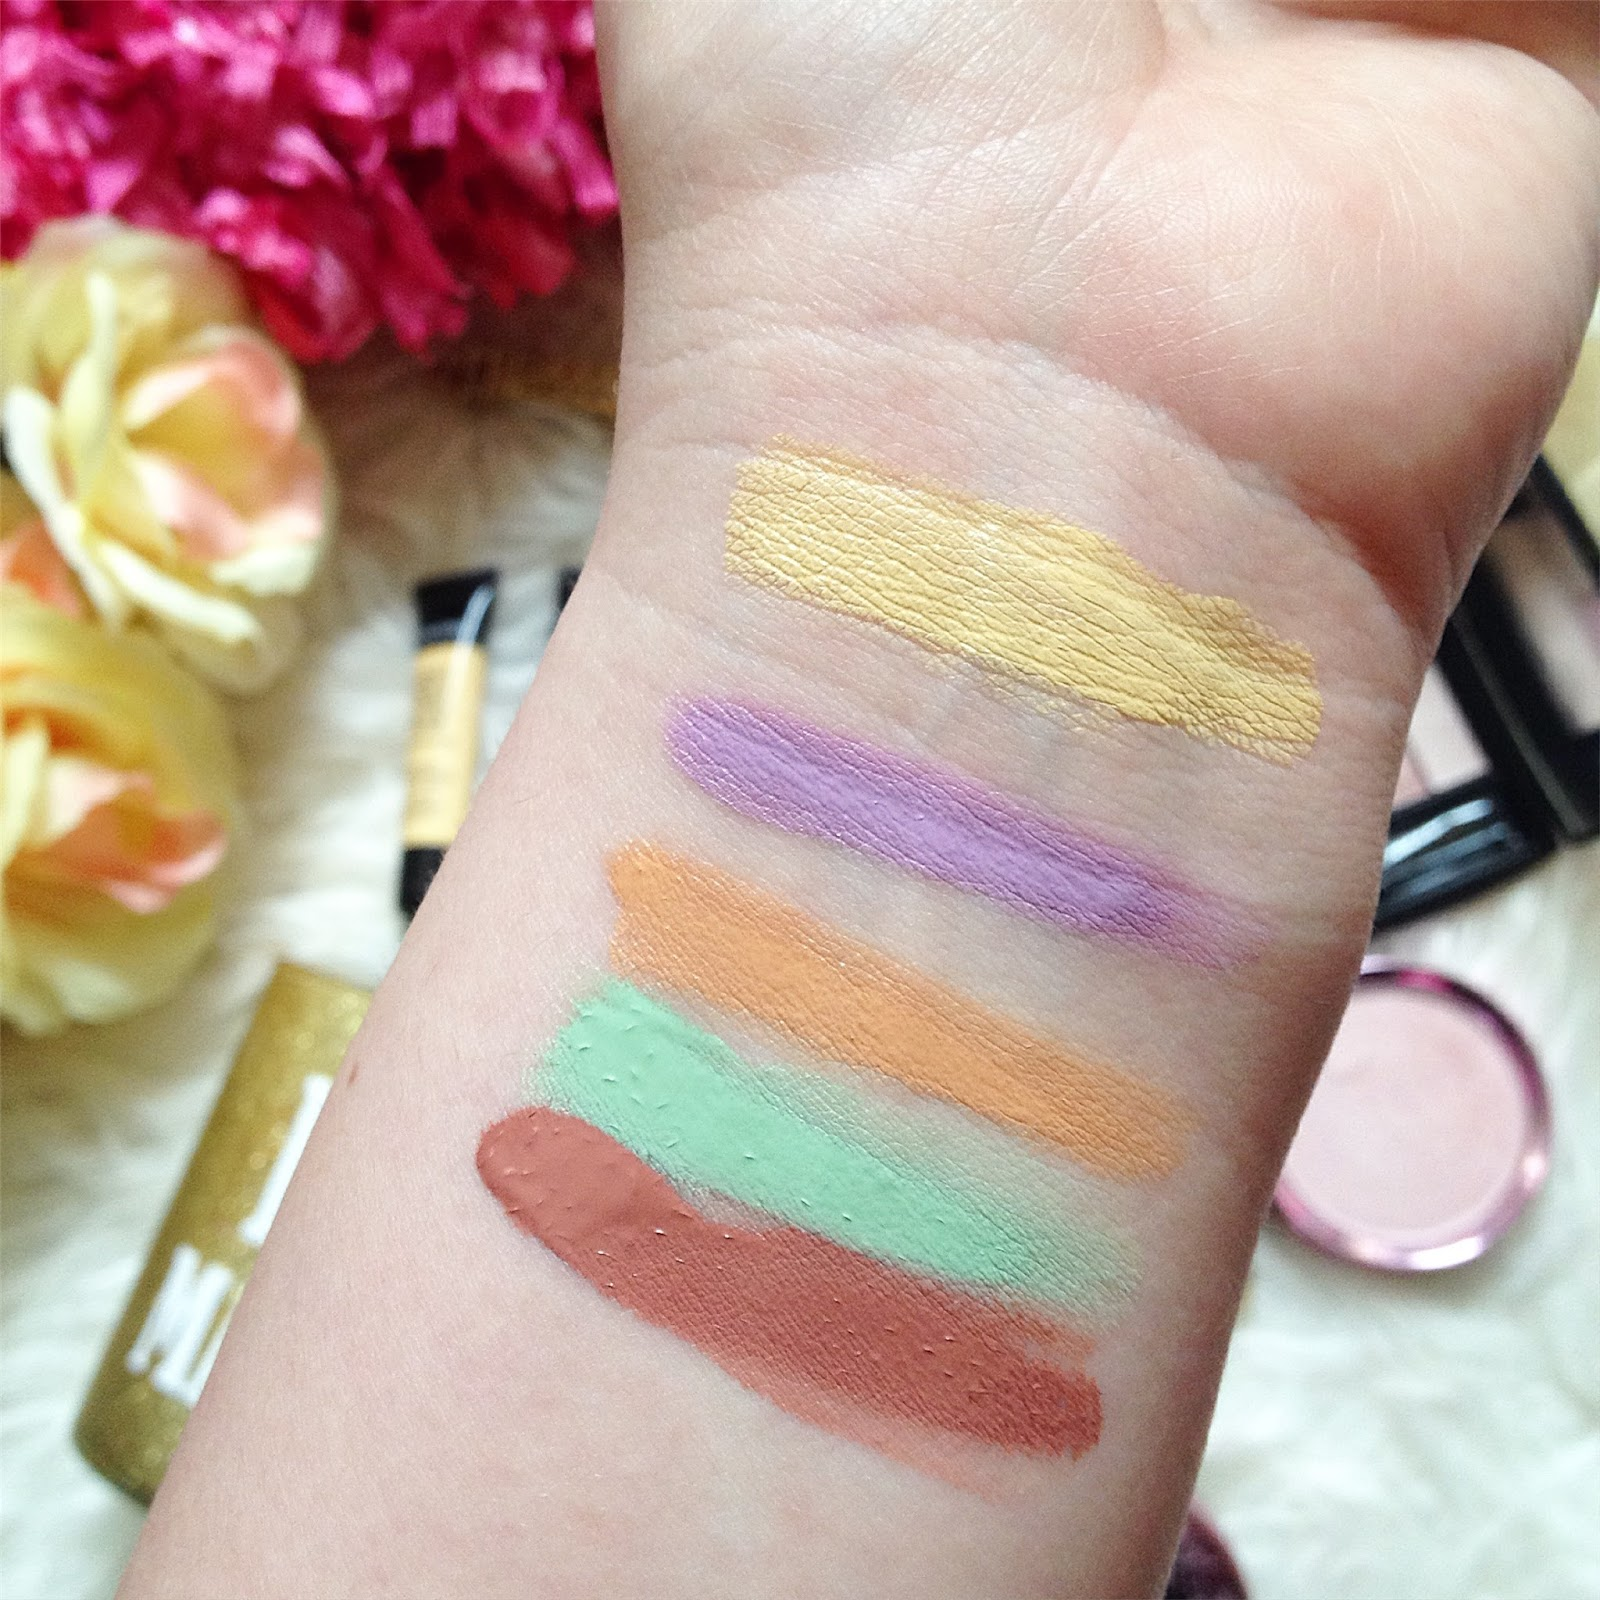 Teint Idole Ultra Wear Camouflage Color Corrector by Lancôme #6